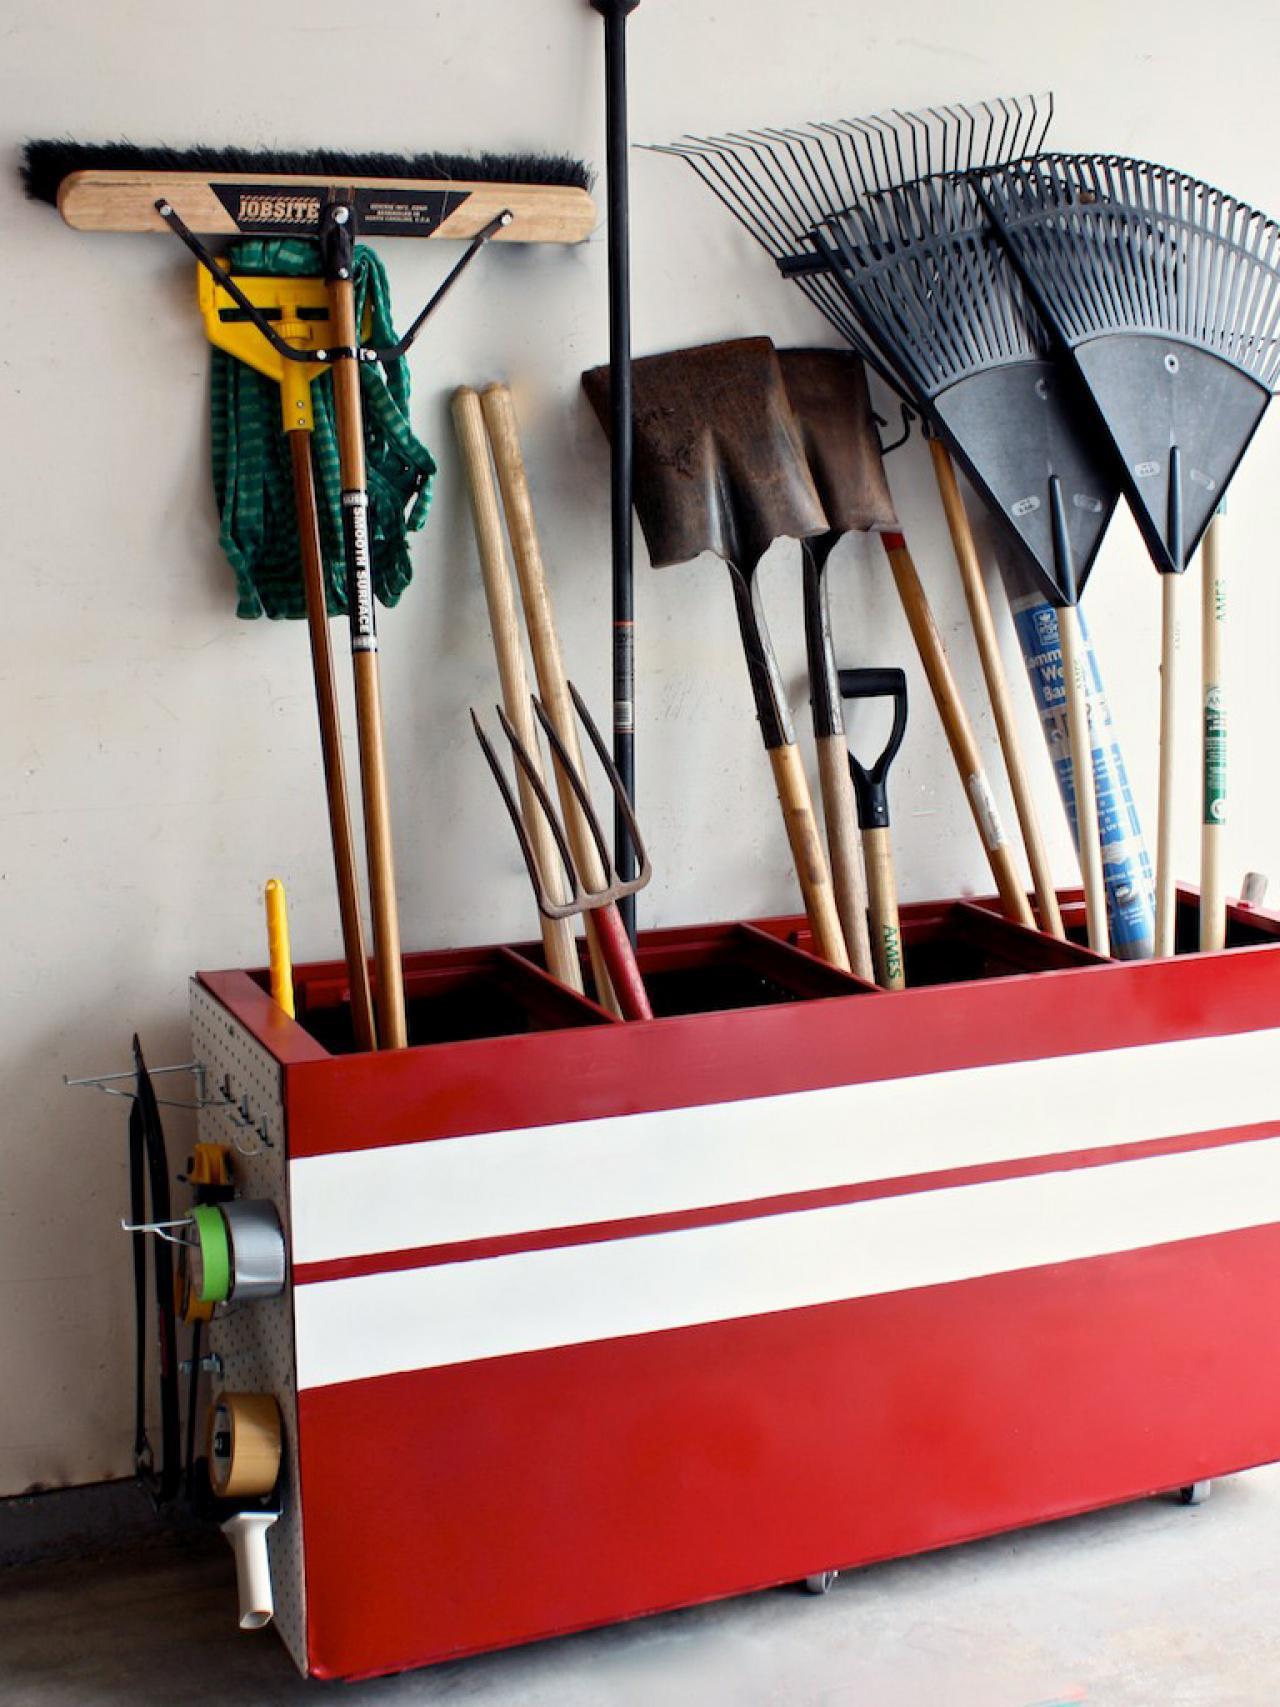 Original haydee letonja garage organization file cabinet for yard tools s3x4.jpg.rend.hgtvcom.1280.1707